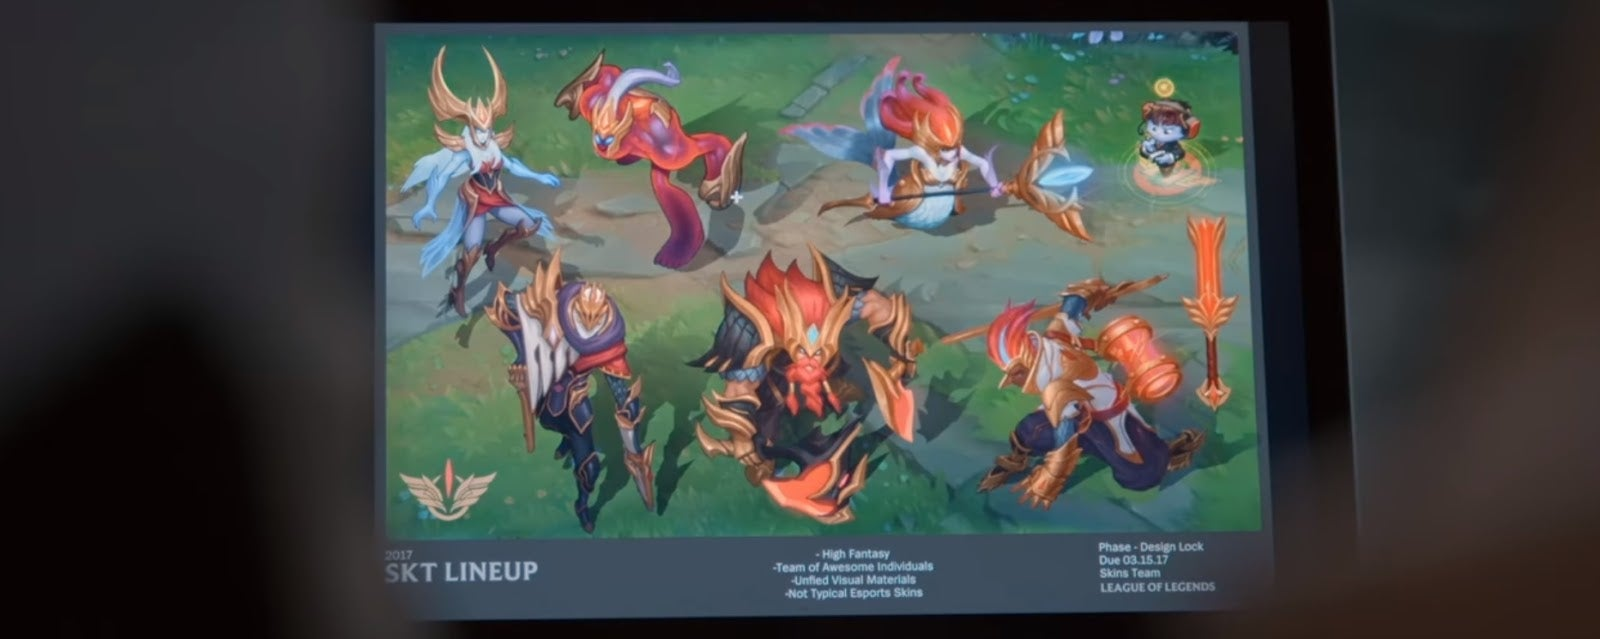 League Of Legends Riot Reveals First Look At New Skt T1 Skins